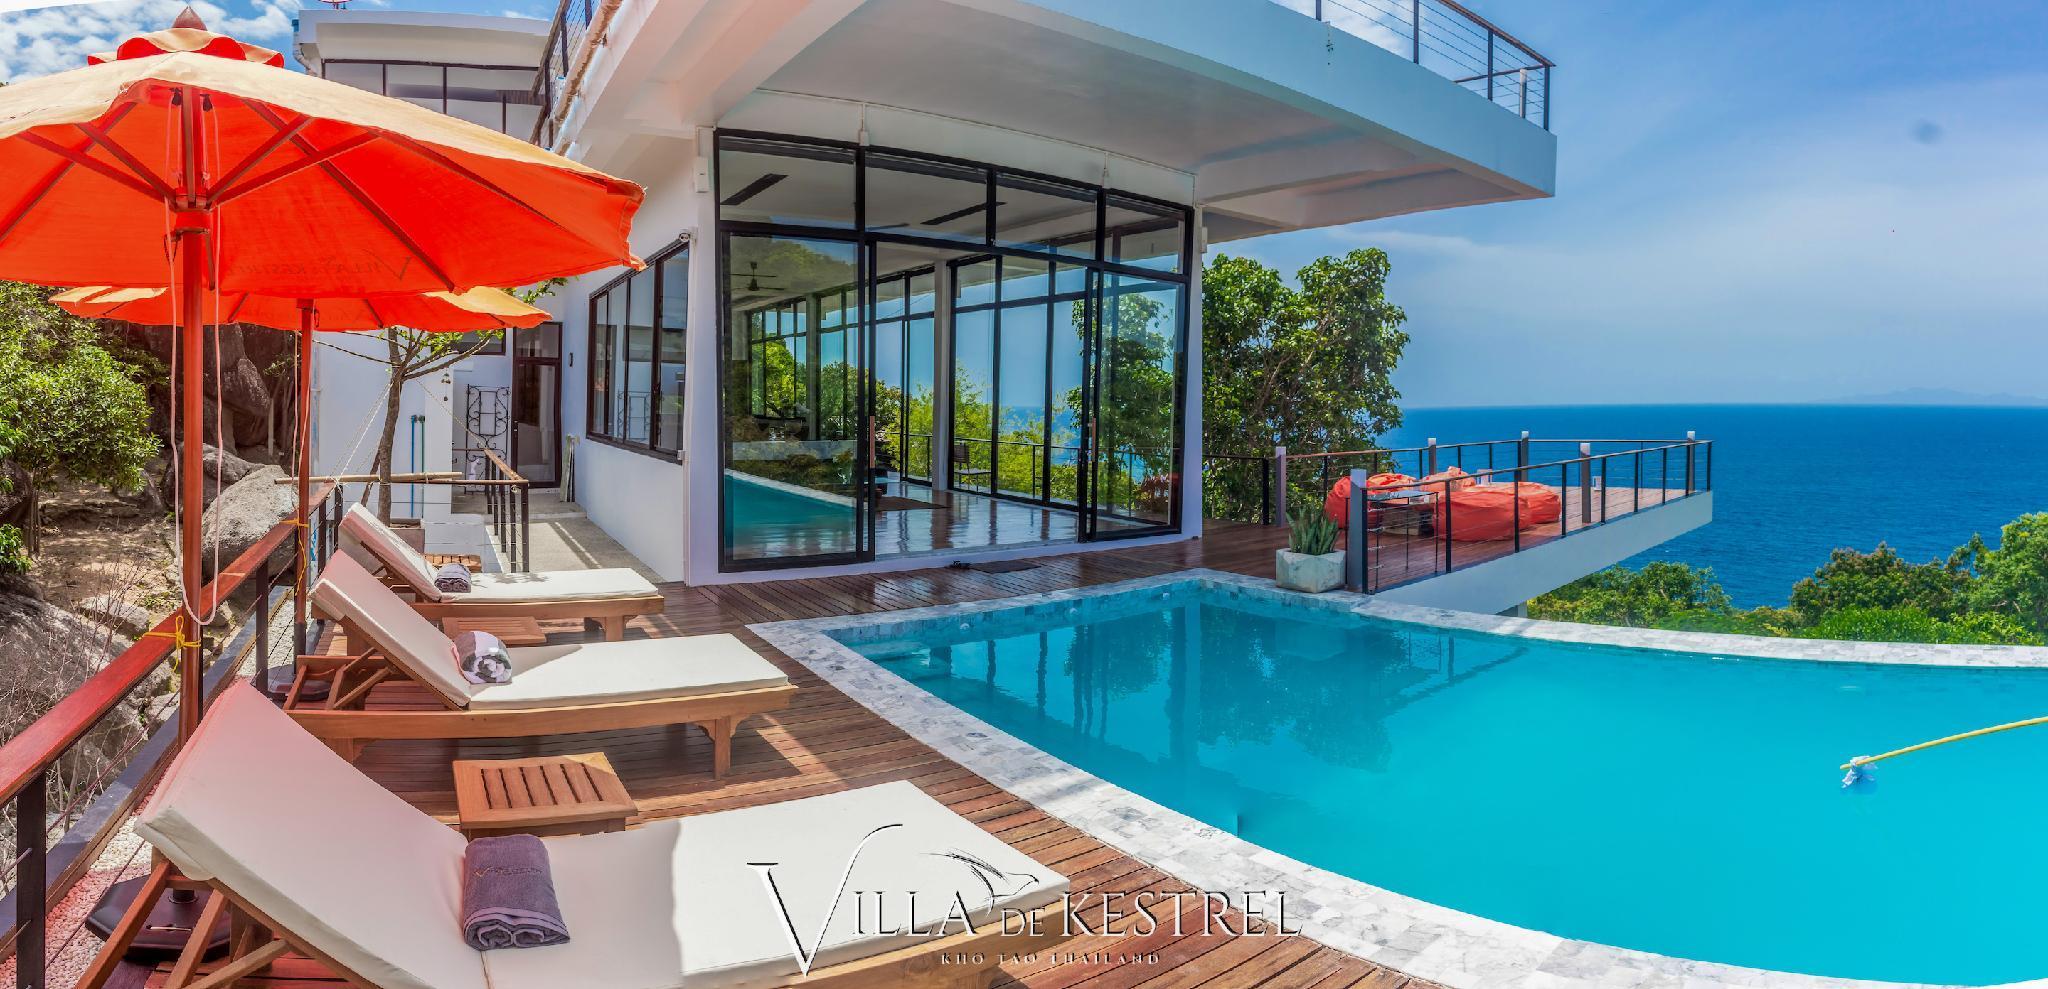 Villa De Kestrel 3 Bedrooms